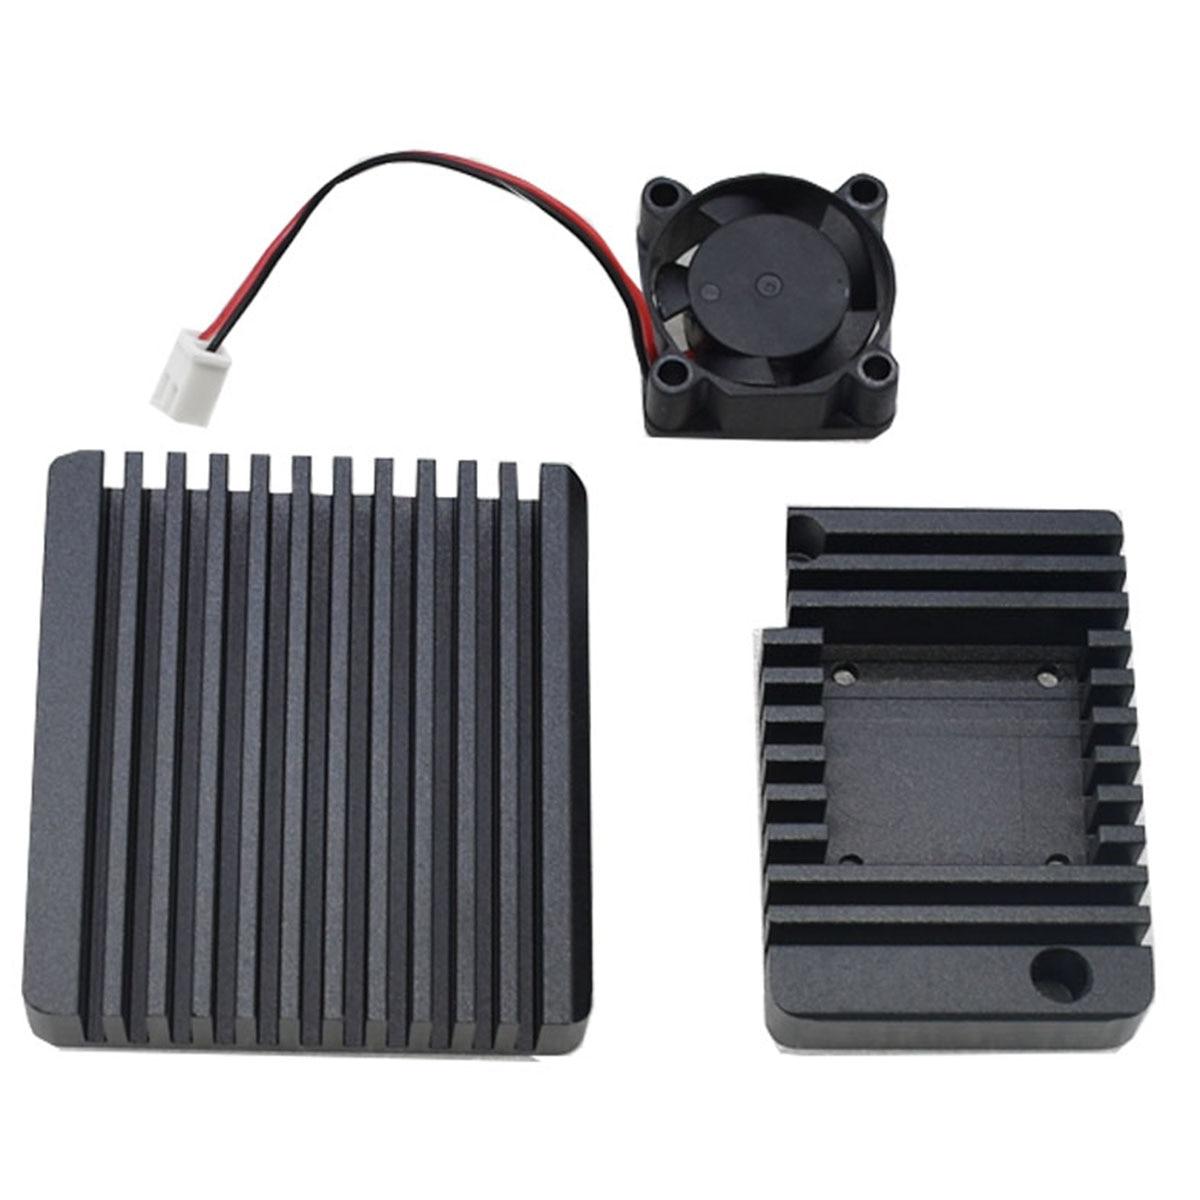 1 Set Of Quality Aluminum Case And Fan For NanoPi R2S Black Blue Golden Optional